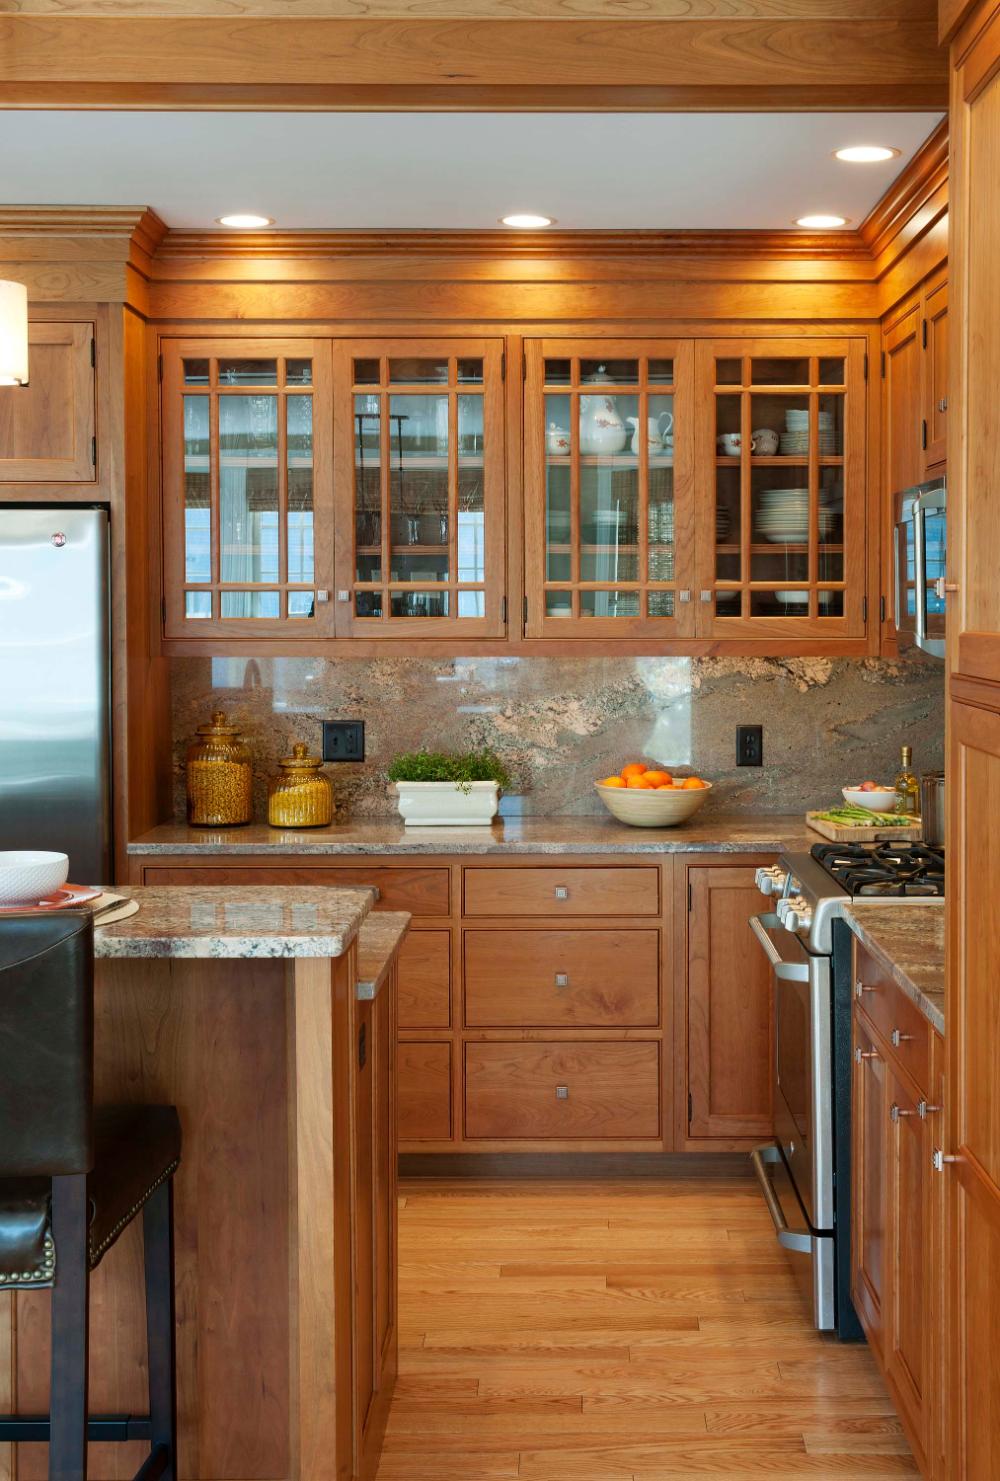 Gallery 92 Craftsman Style Kitchens Rustic Kitchen Kitchen Remodel